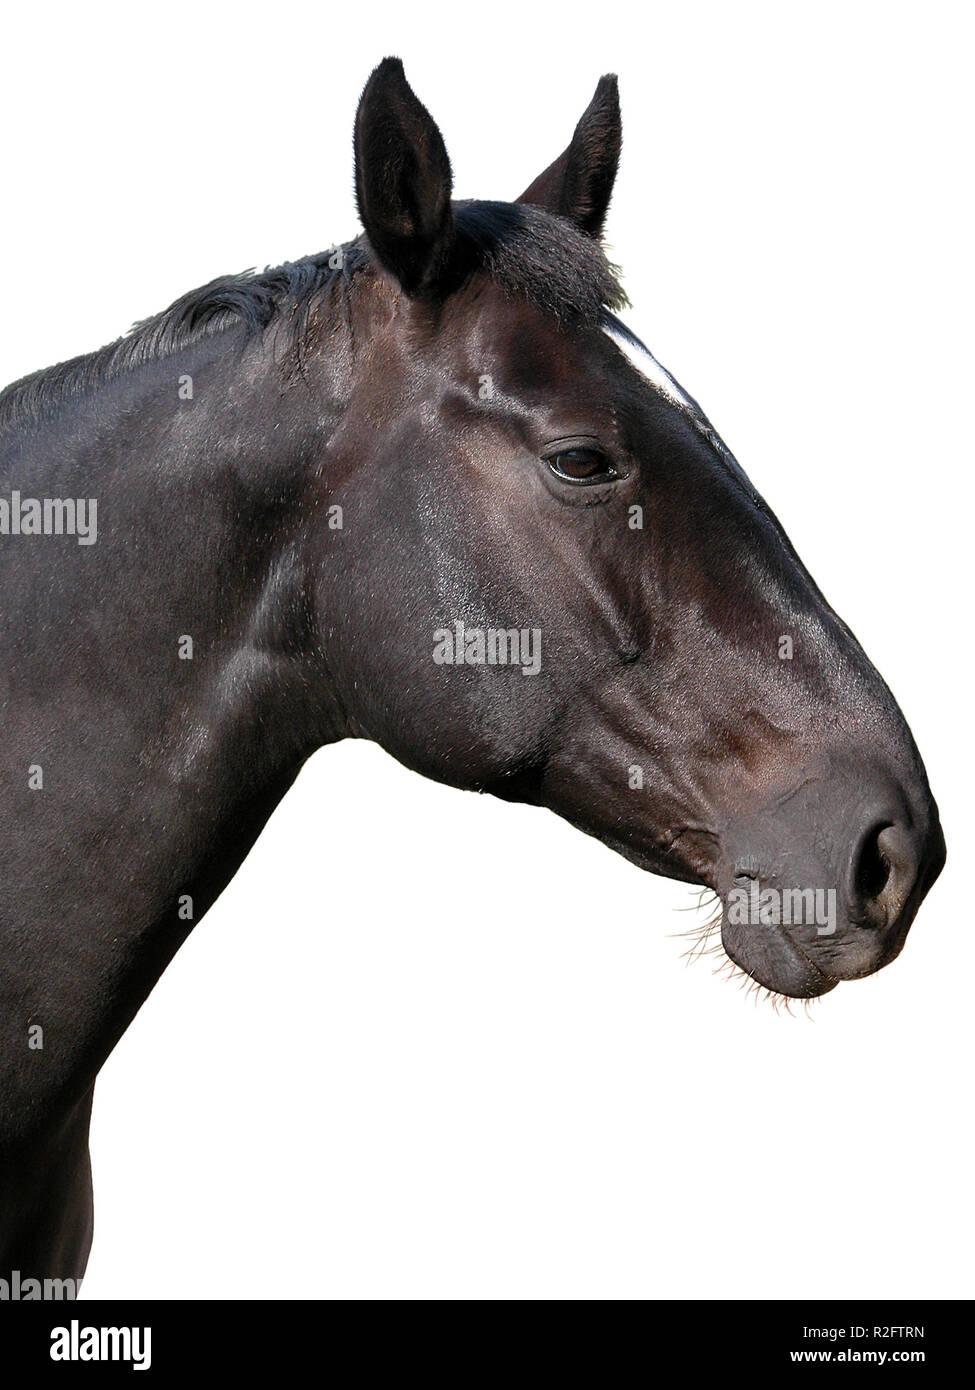 Black Horse Head Optional Stock Photo Alamy